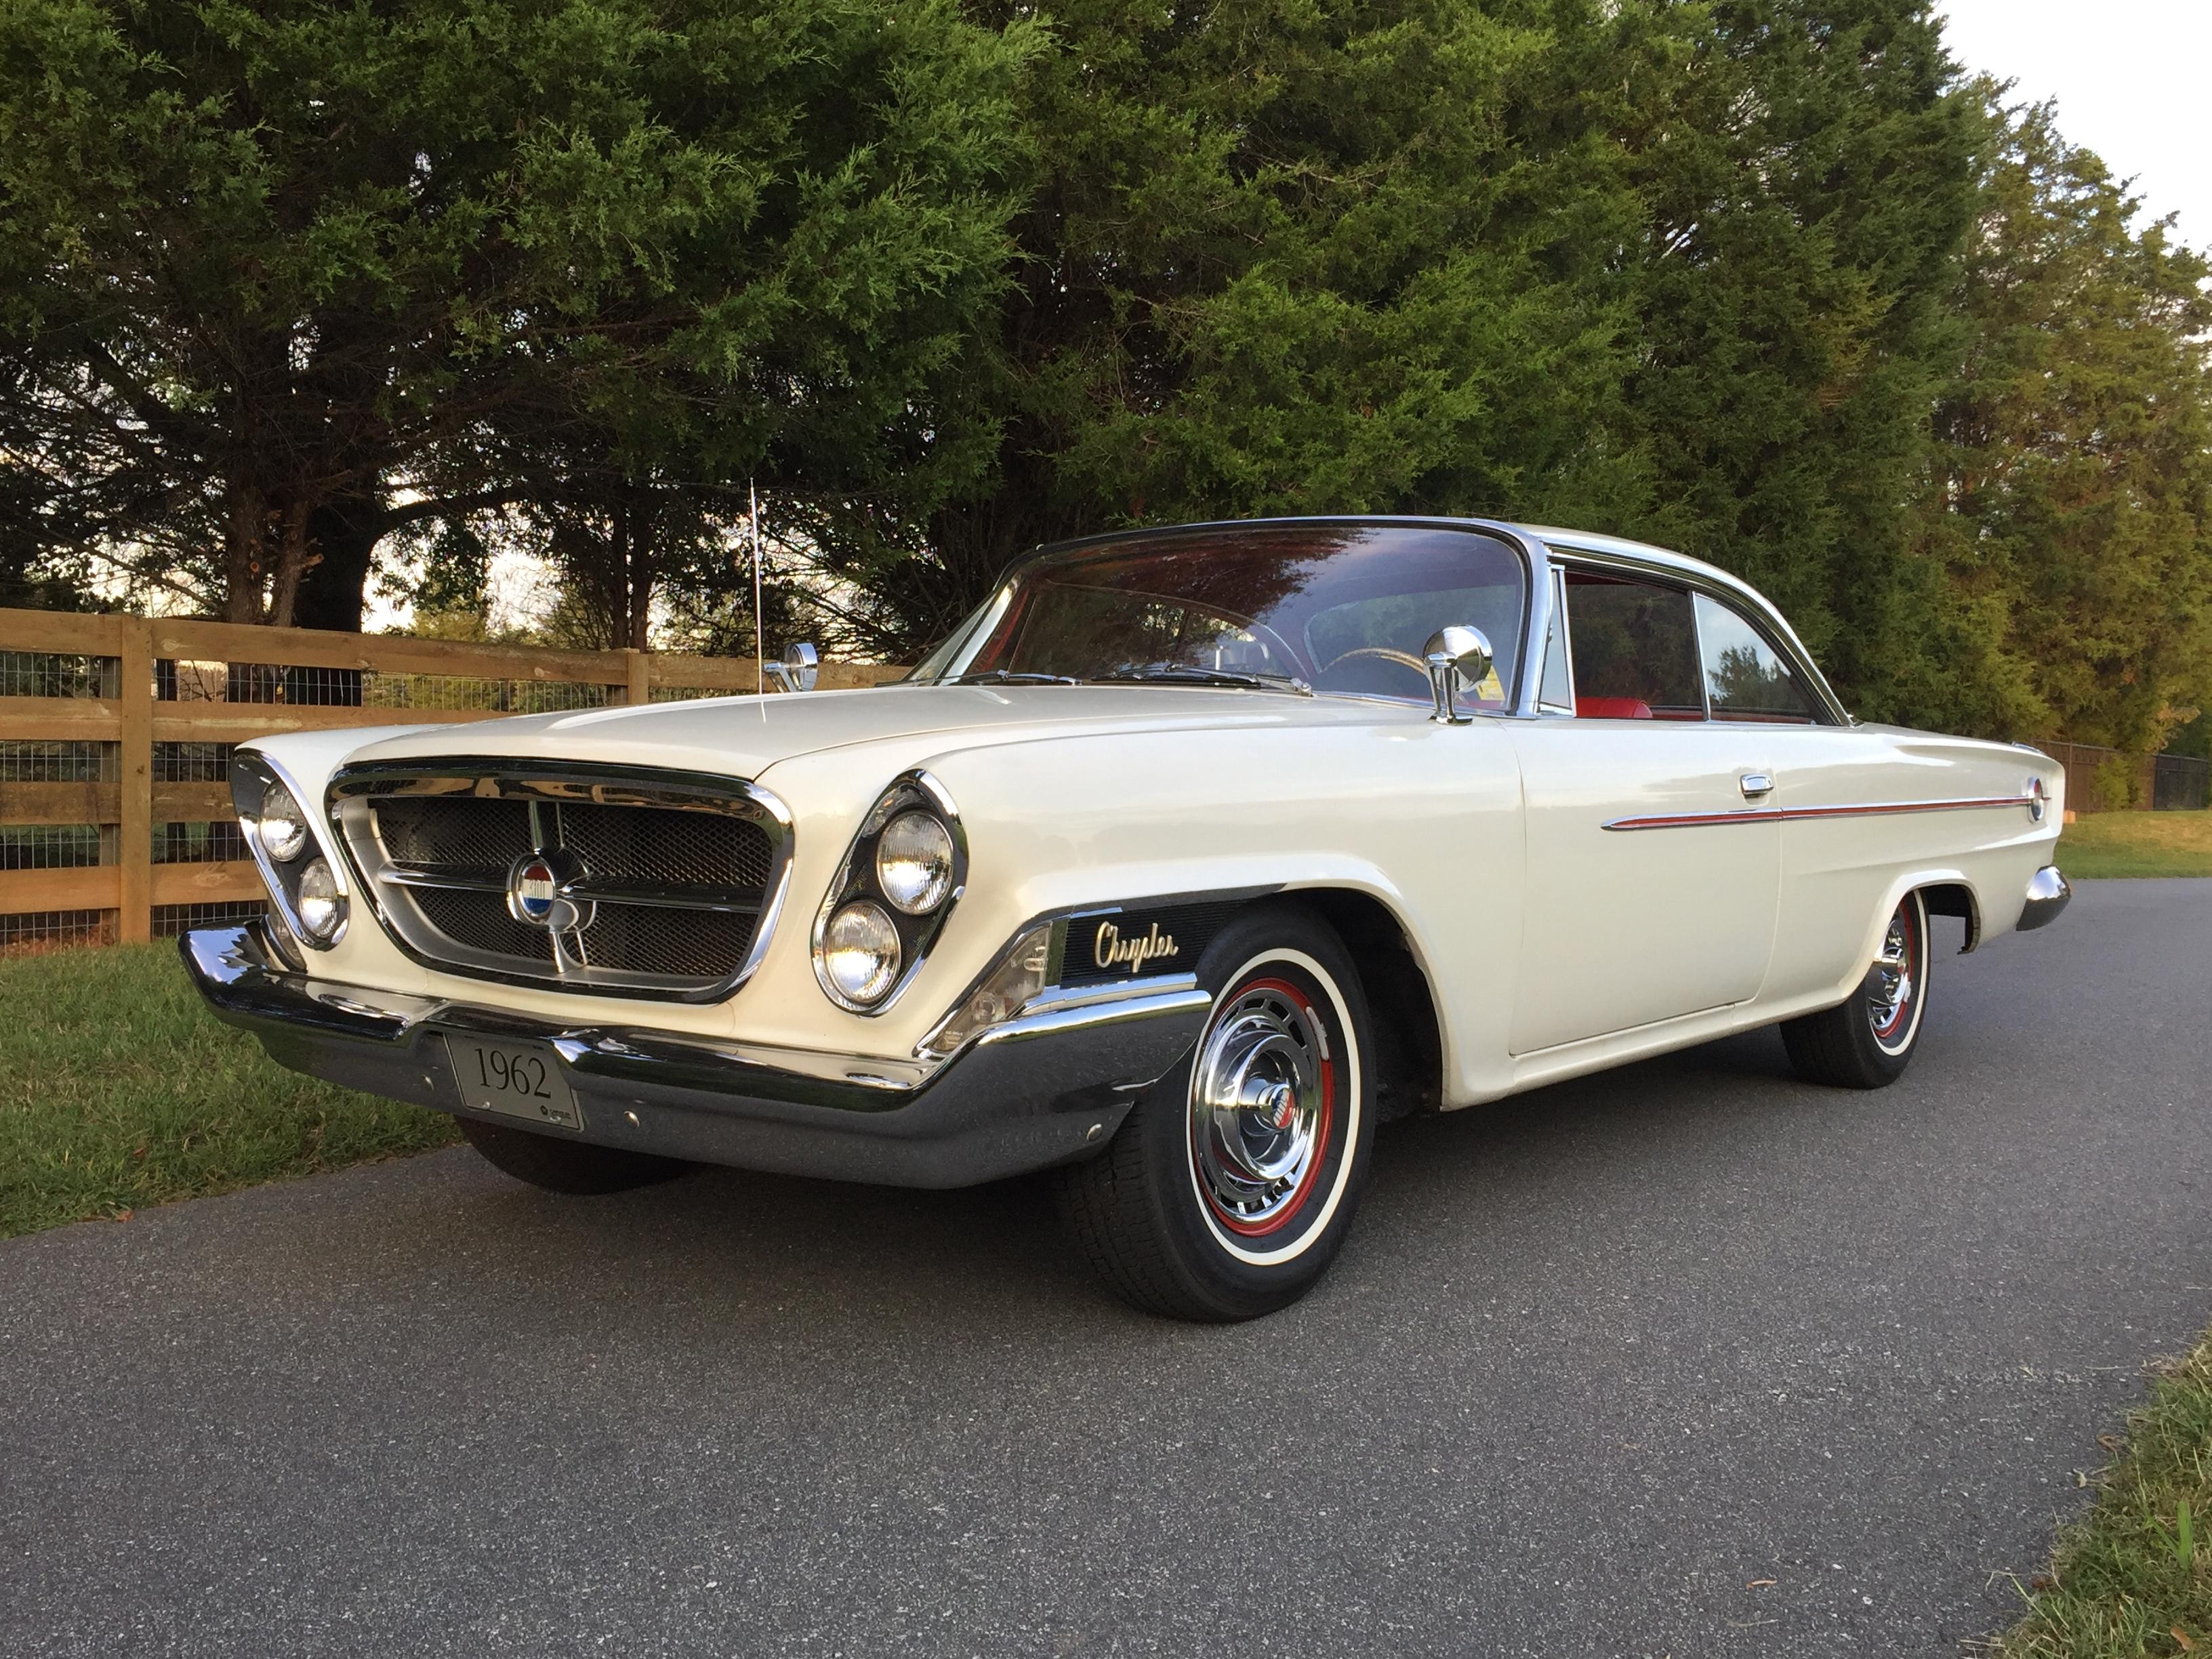 1962 chrysler 300 sport gaa classic cars. Black Bedroom Furniture Sets. Home Design Ideas